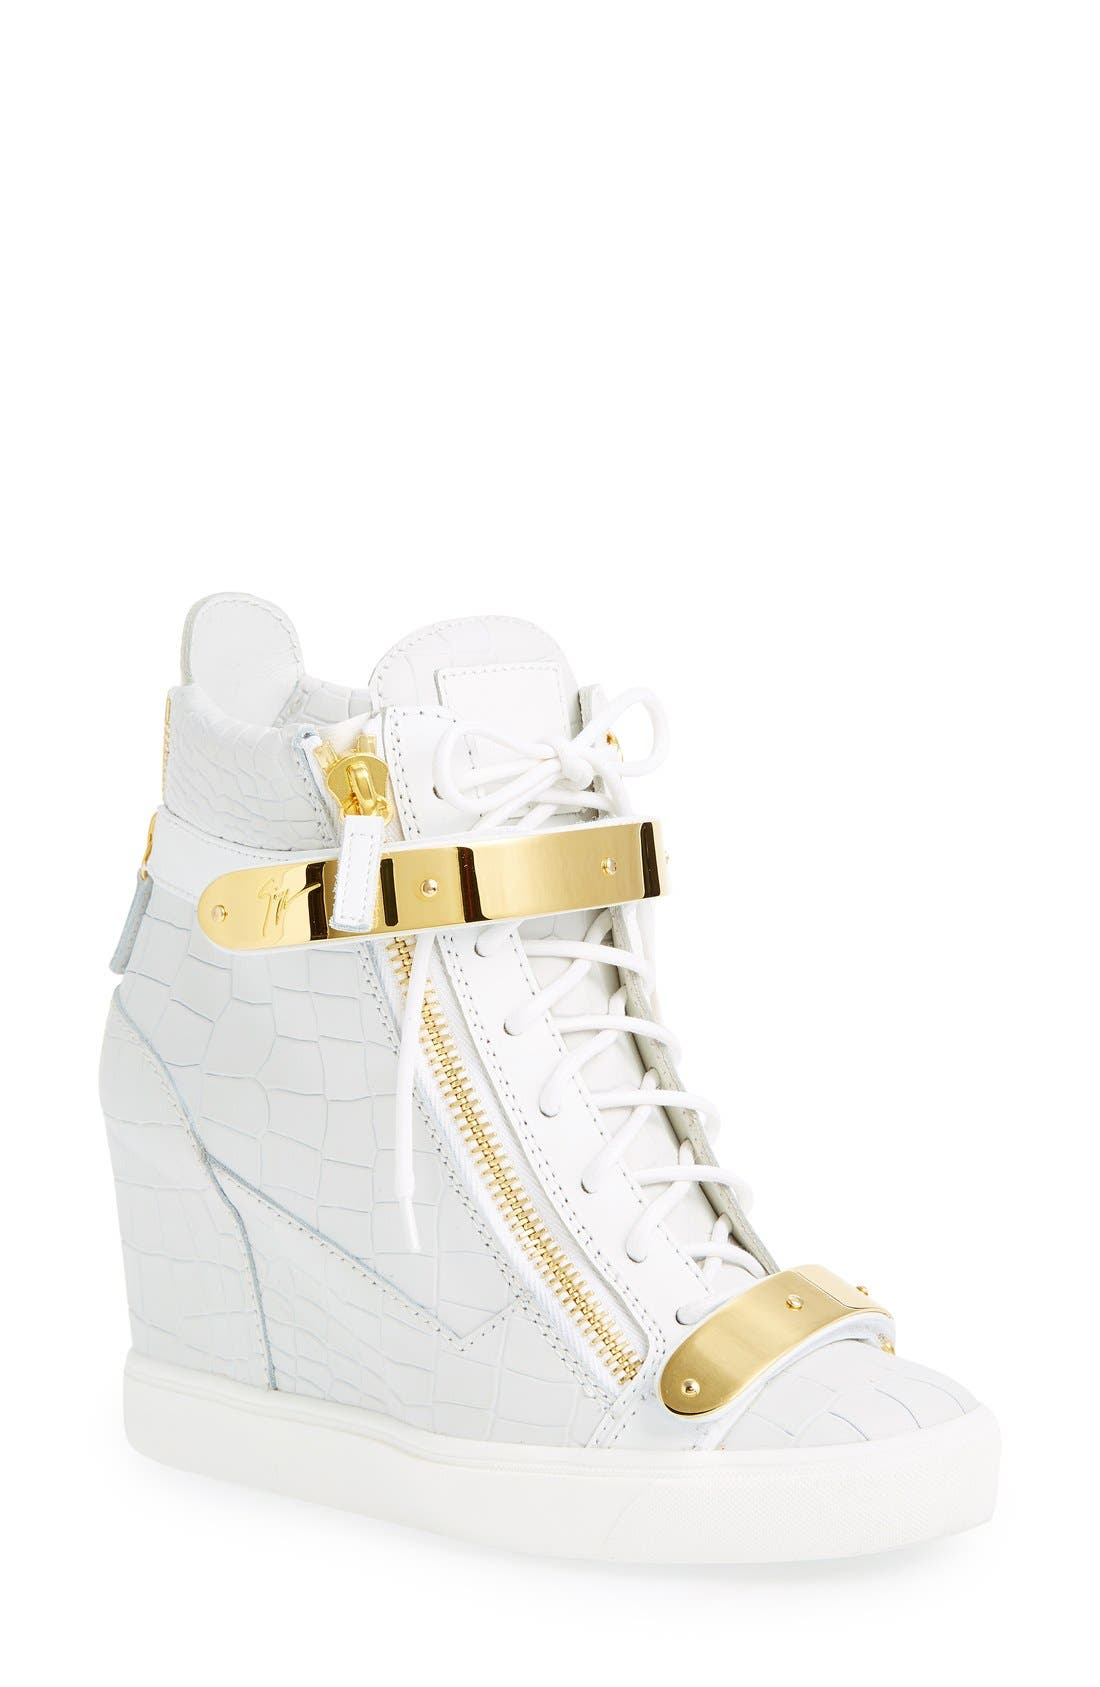 Alternate Image 1 Selected - Giuseppe Zanotti'Lorenz' Wedge Sneaker (Women)